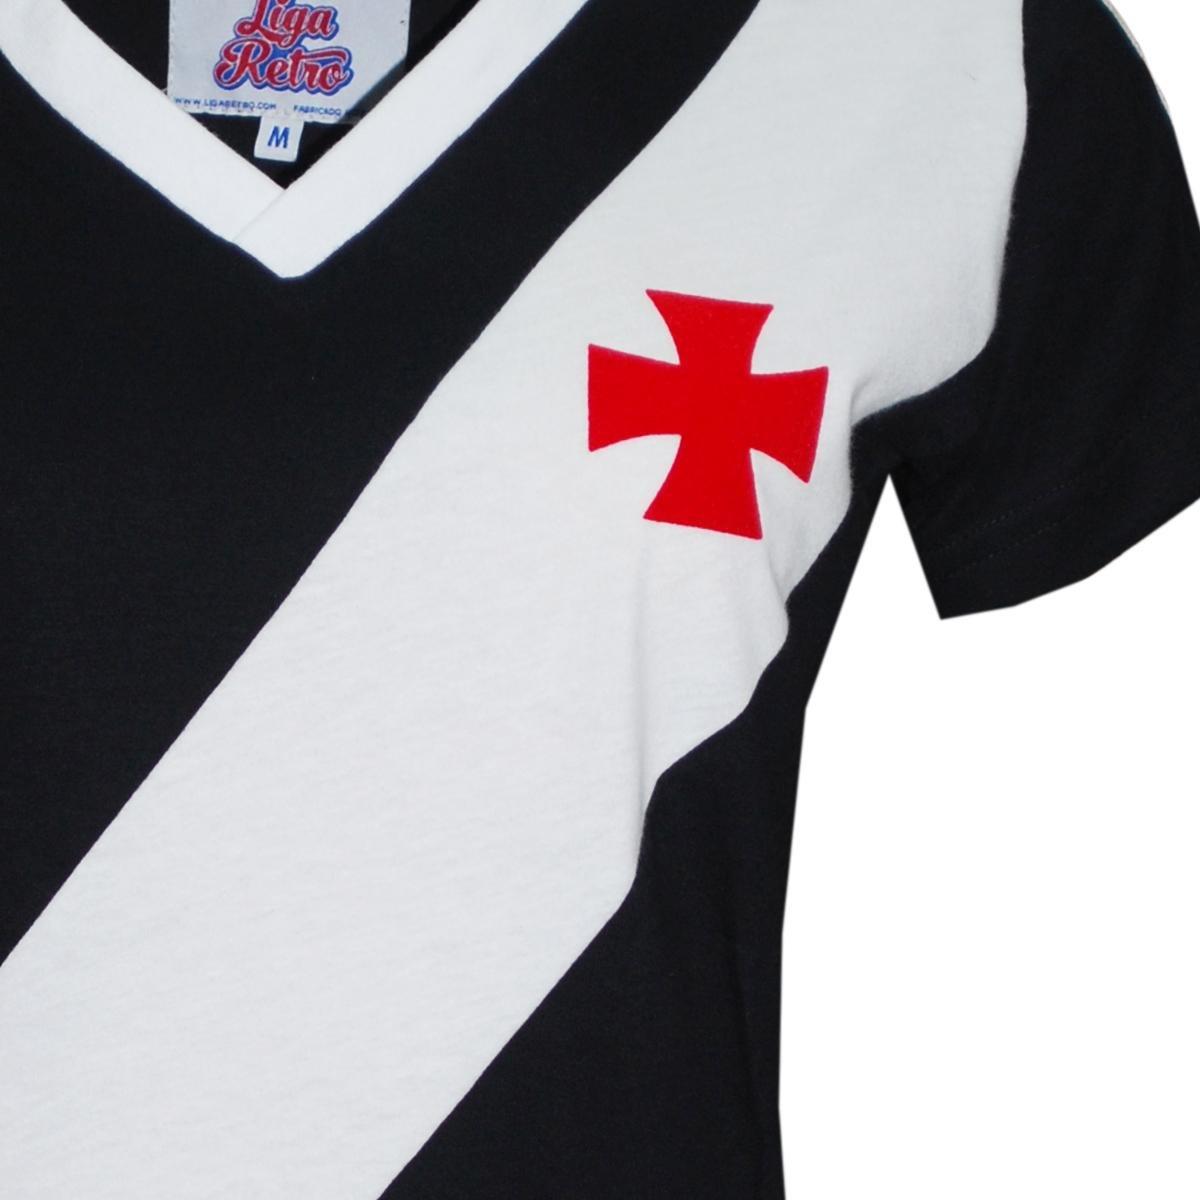 Casmisa Polo Liga Retrô Vasco 1989 Feminino - Preto - Compre Agora ... 13bd62848edd3